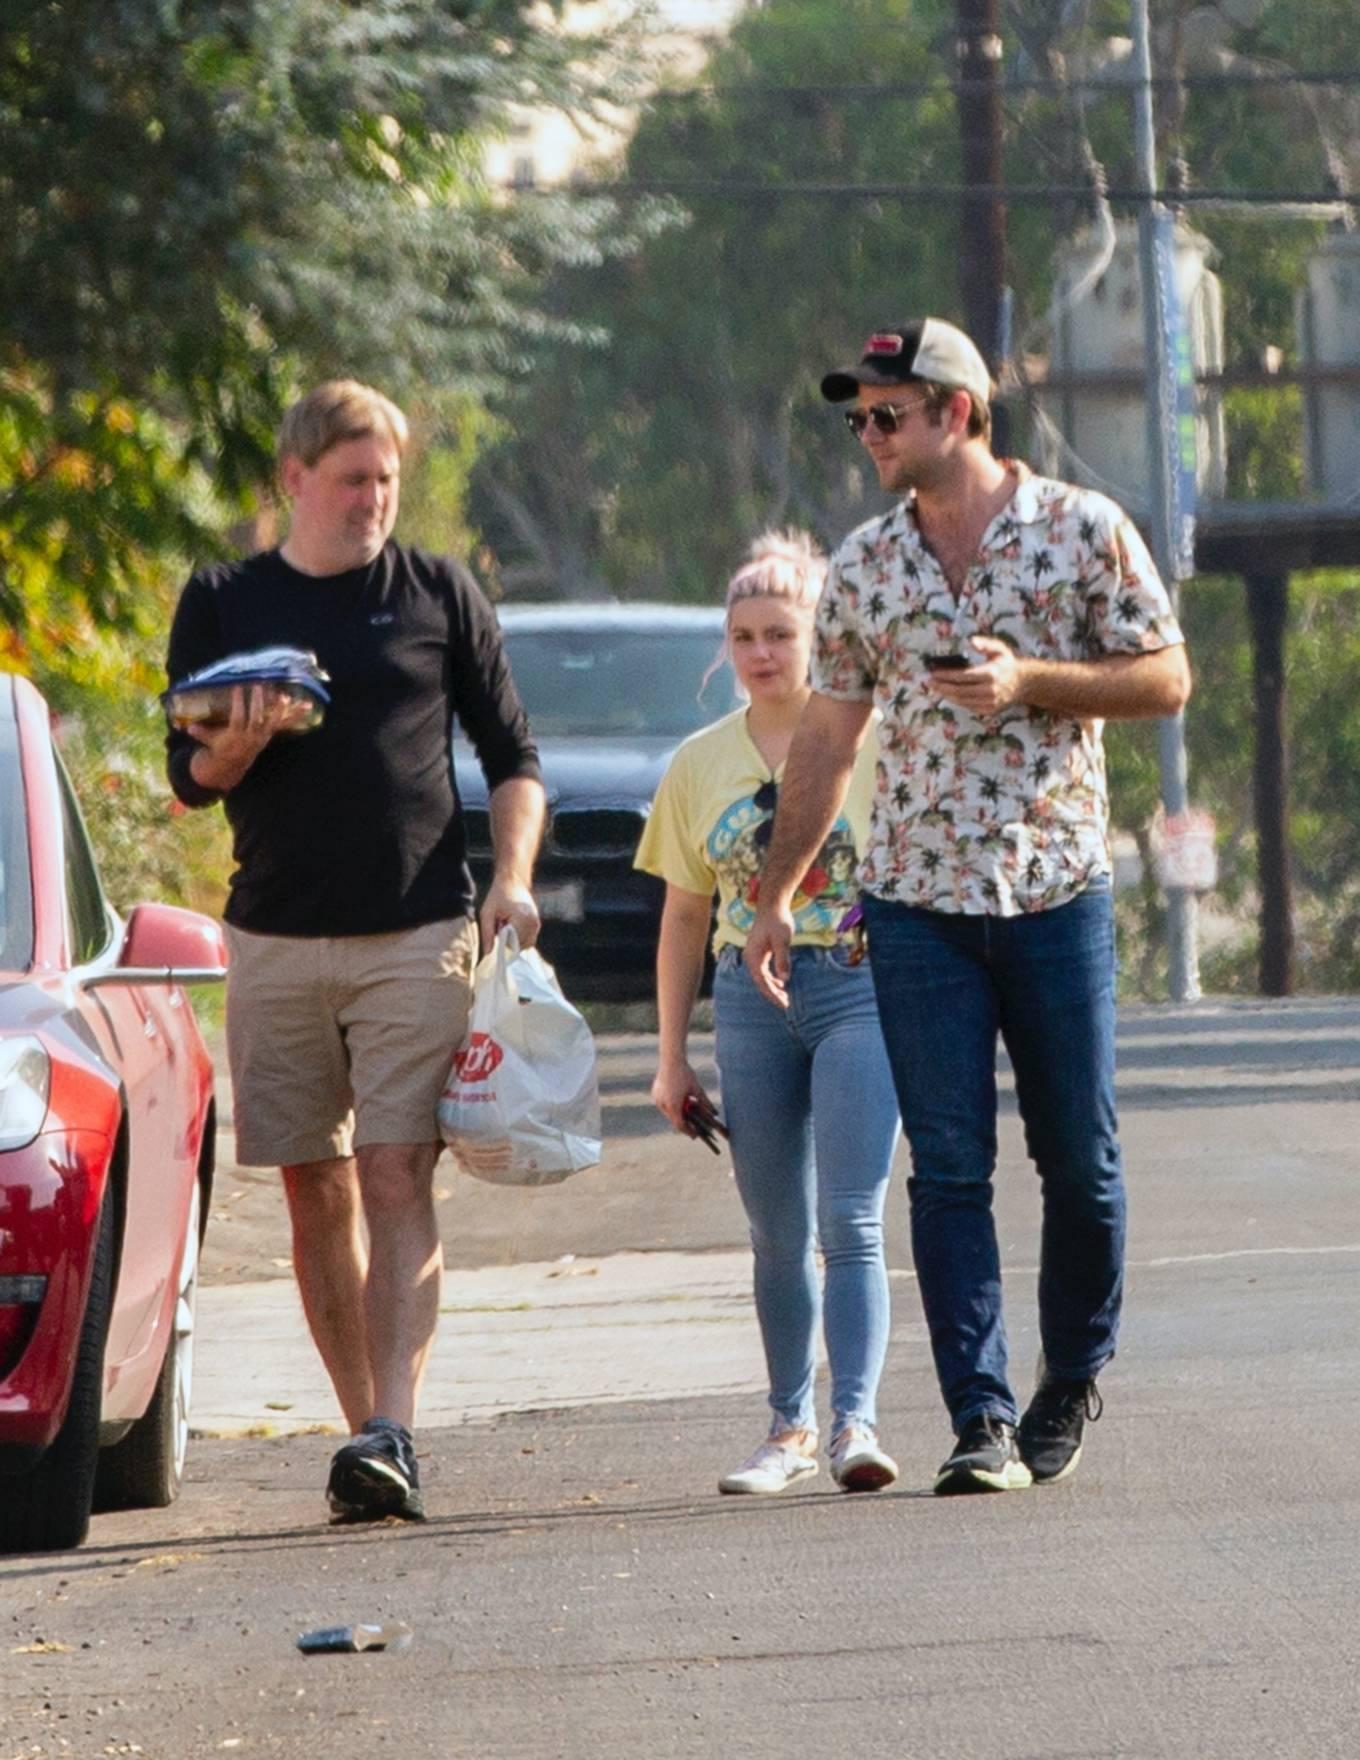 Ariel Winter and Luke Benward - Seen outside their home in Studio City